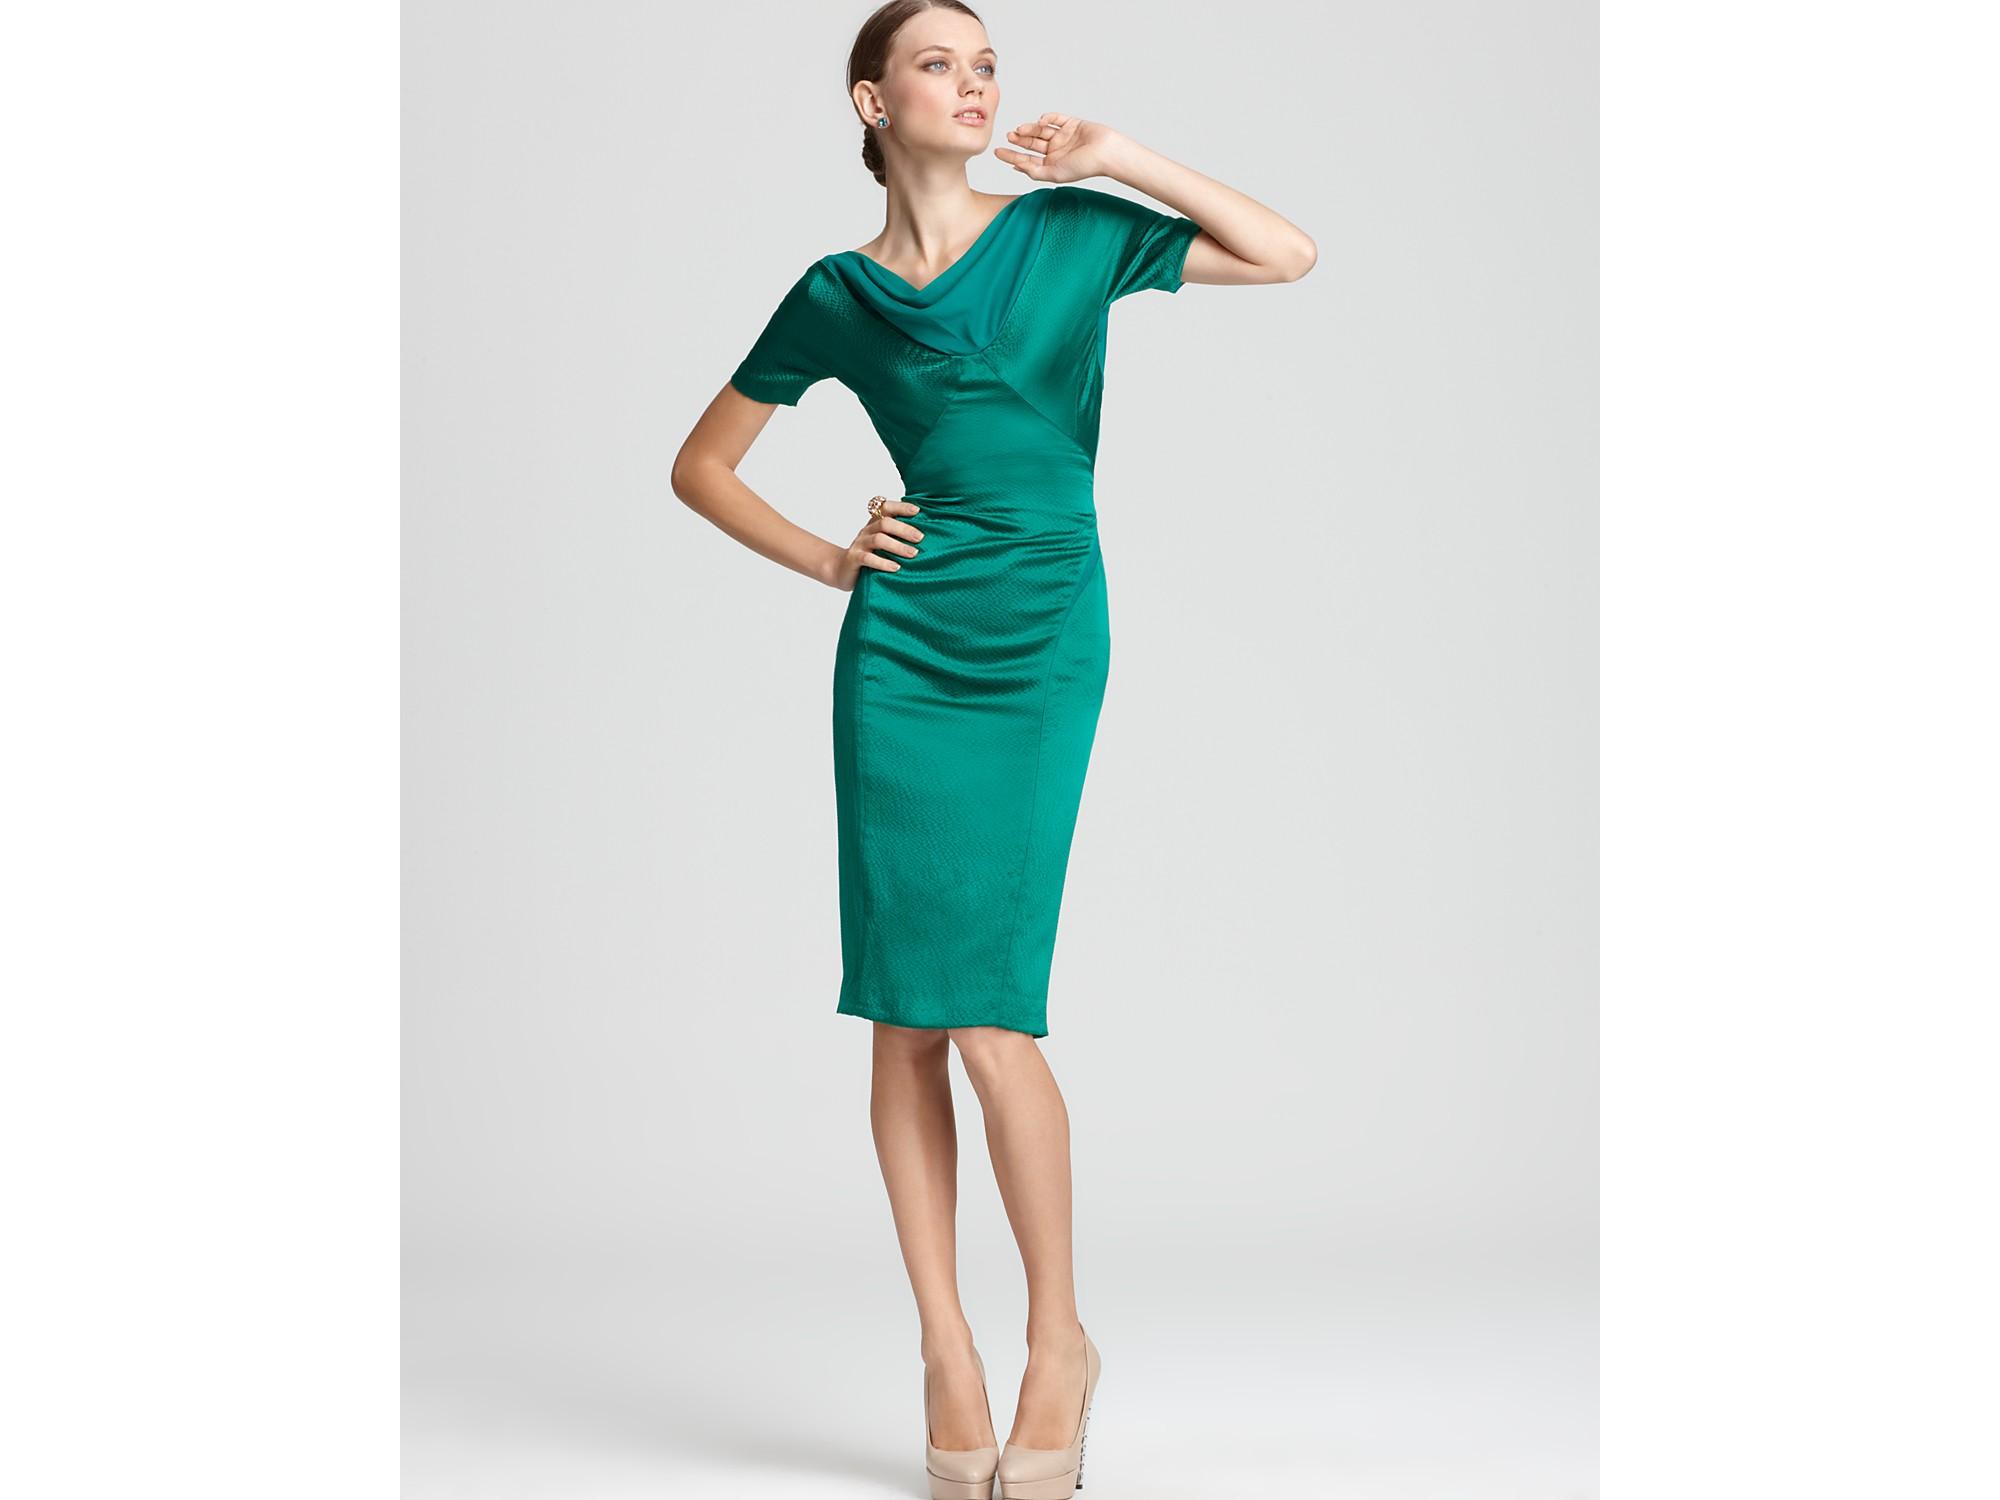 Lyst - Zac Posen Dress Fitted Short Sleeve in Green